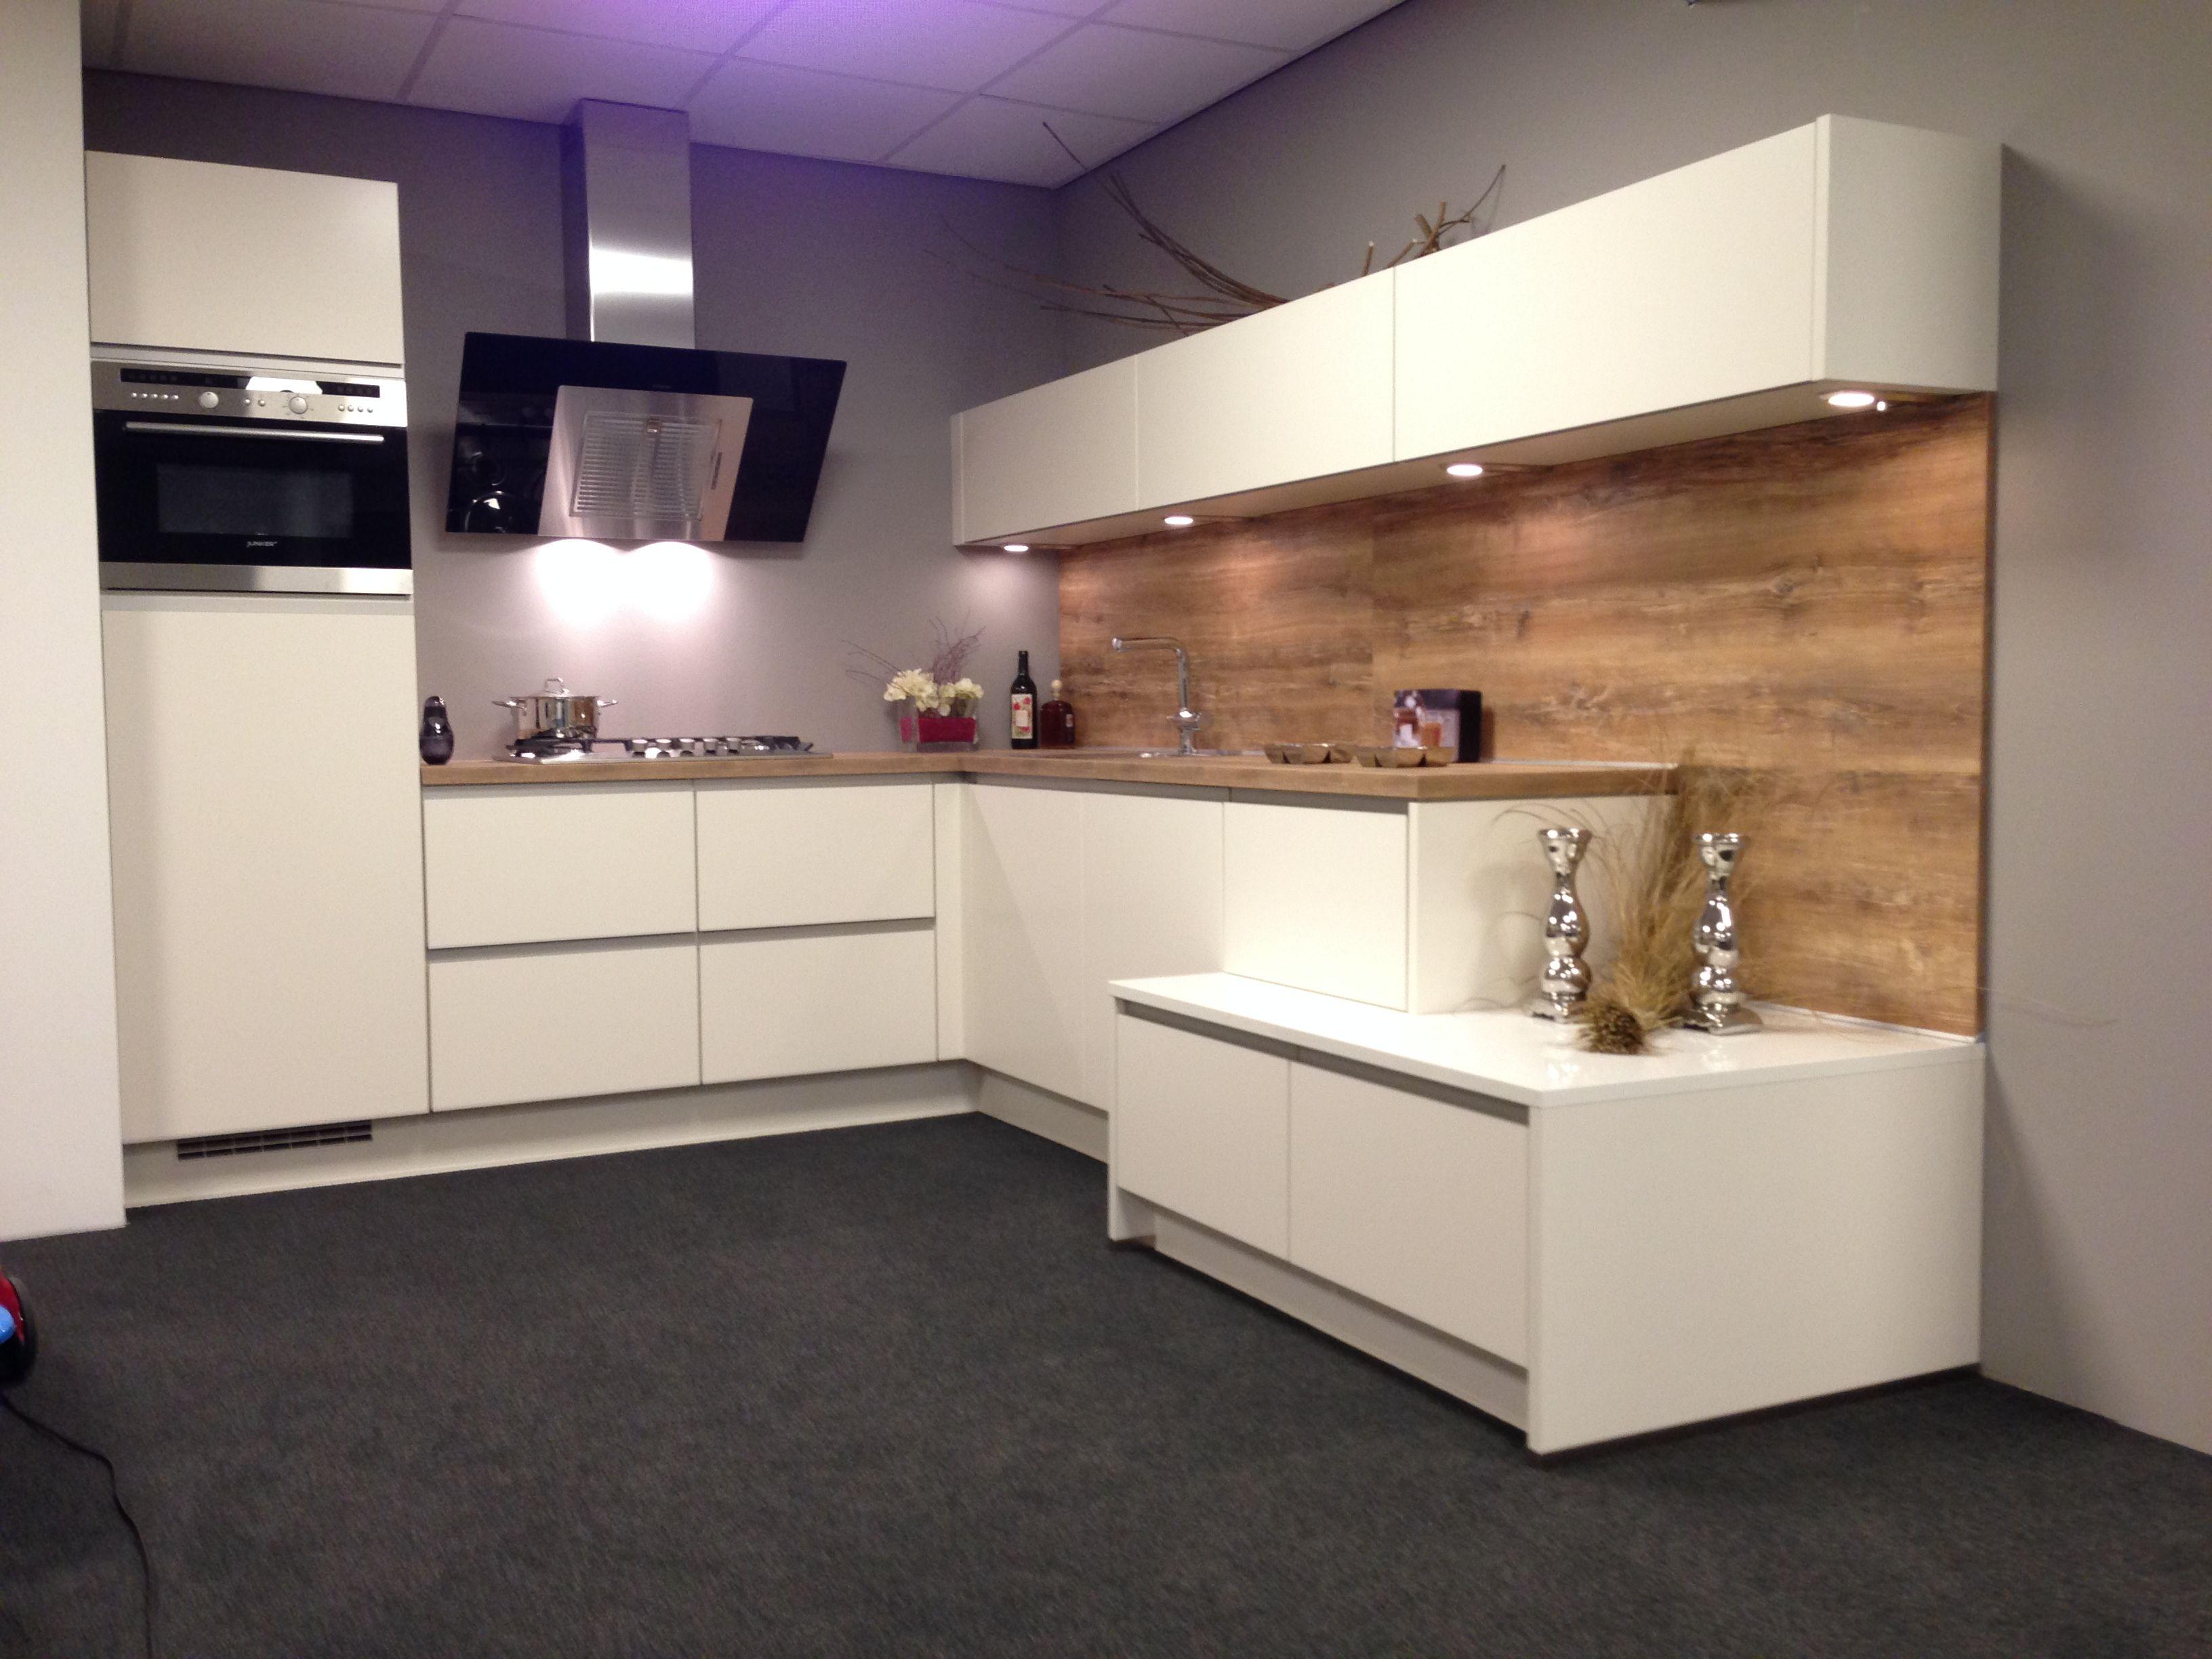 Uitschuifbaar Werkblad Keuken : Fraaie stoere design keuken. hoogglans greeploos wit met een